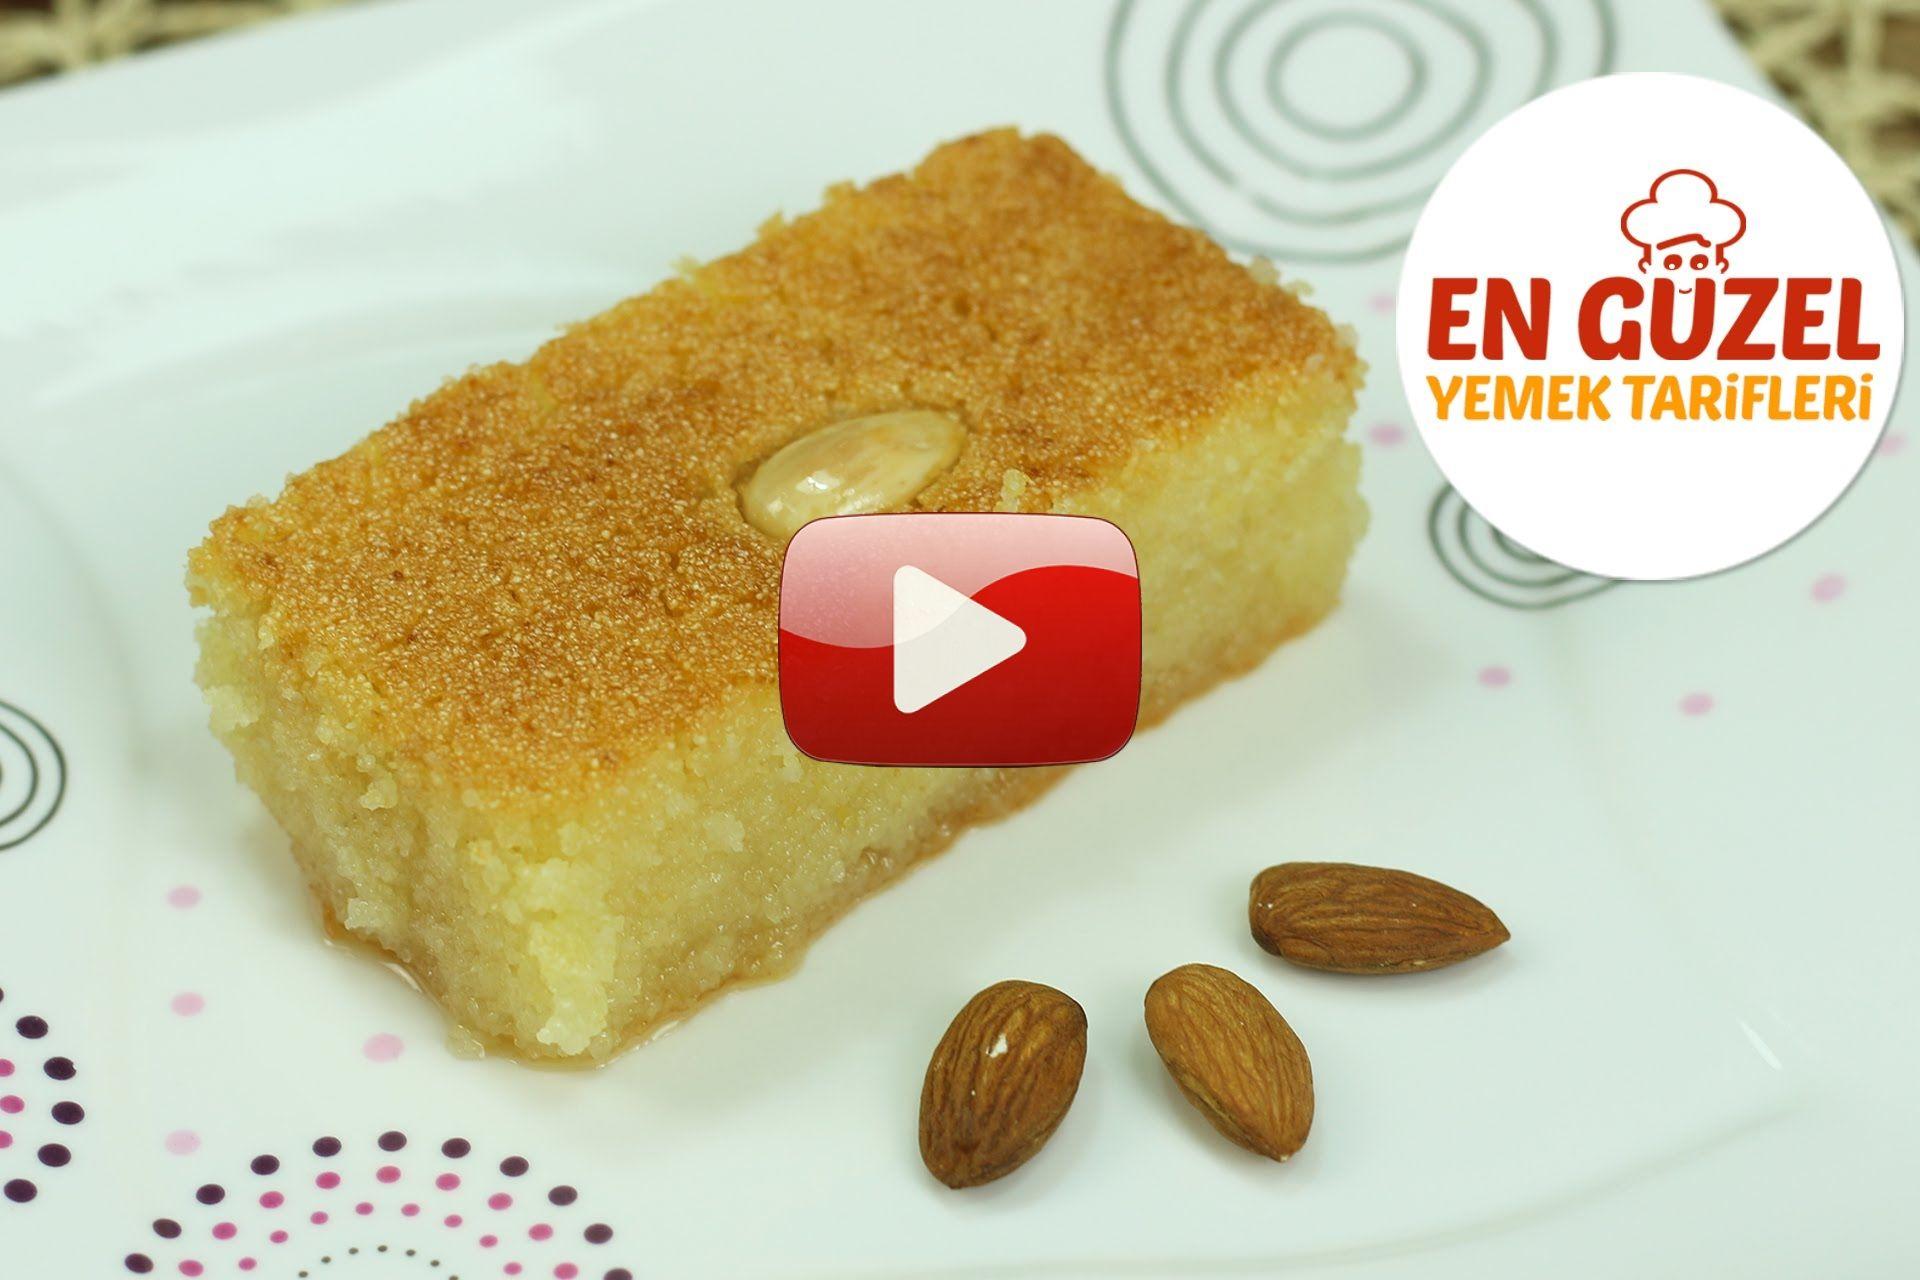 Şam Tatlısı Tarifi Videosu